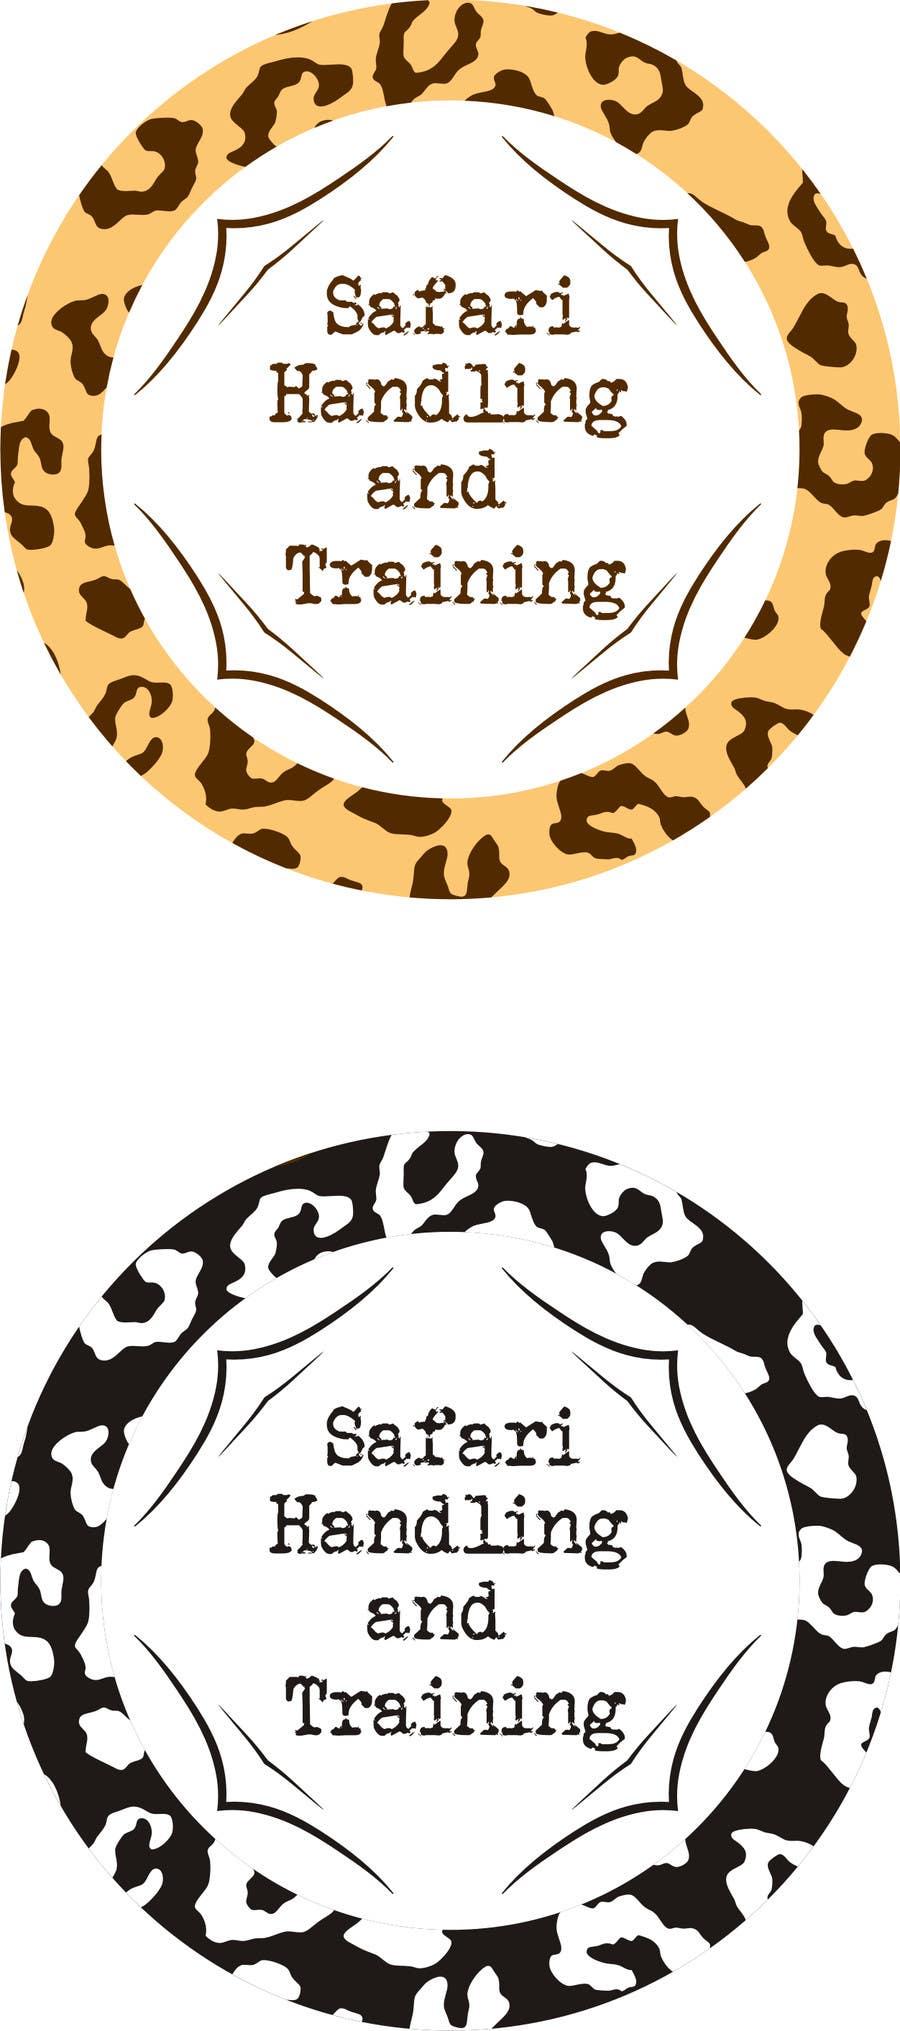 Kilpailutyö #13 kilpailussa Create a Vintage style logo for Safari theme Company